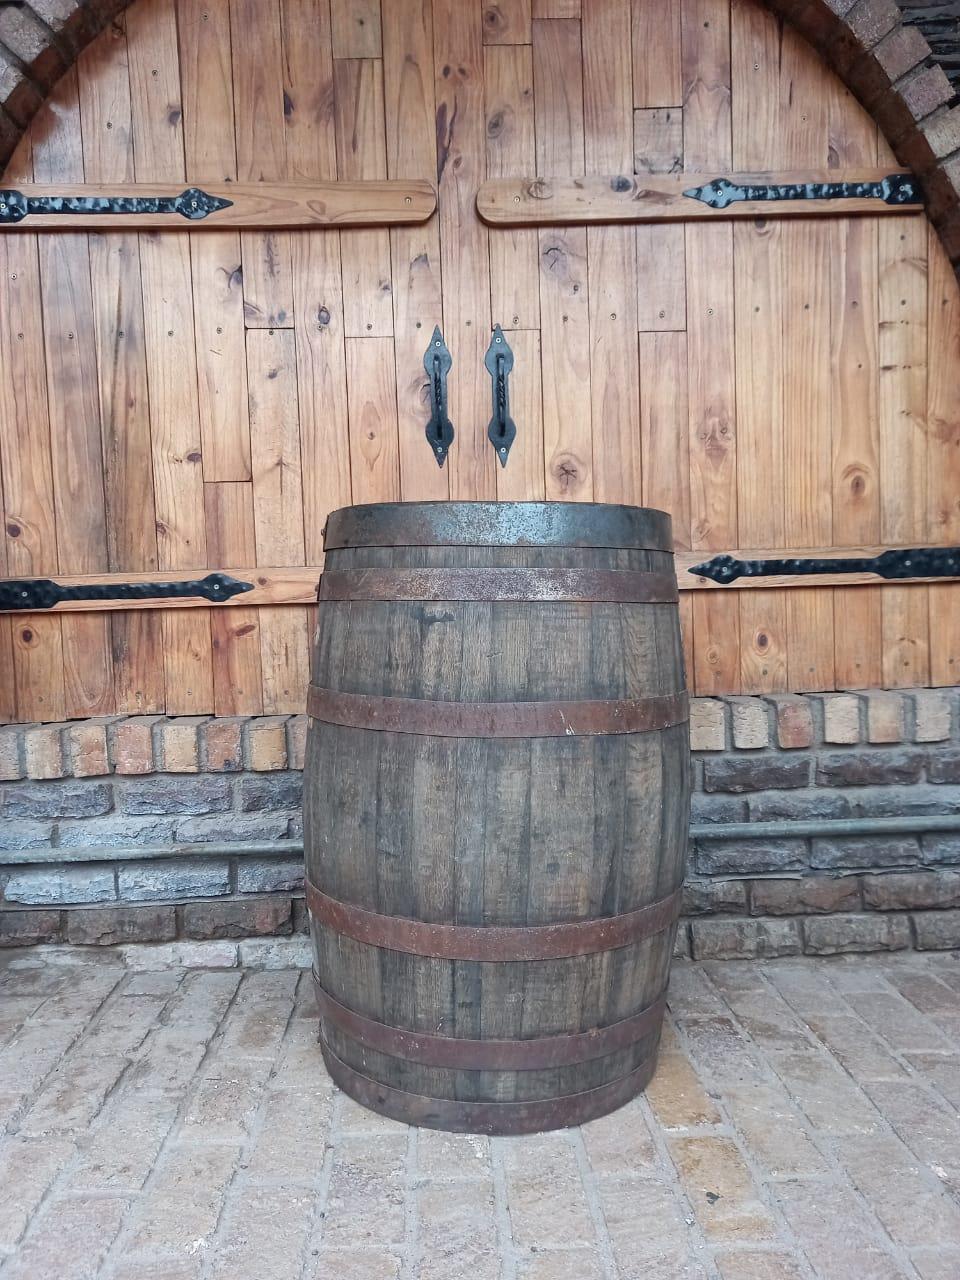 Whiskey barrels for sale